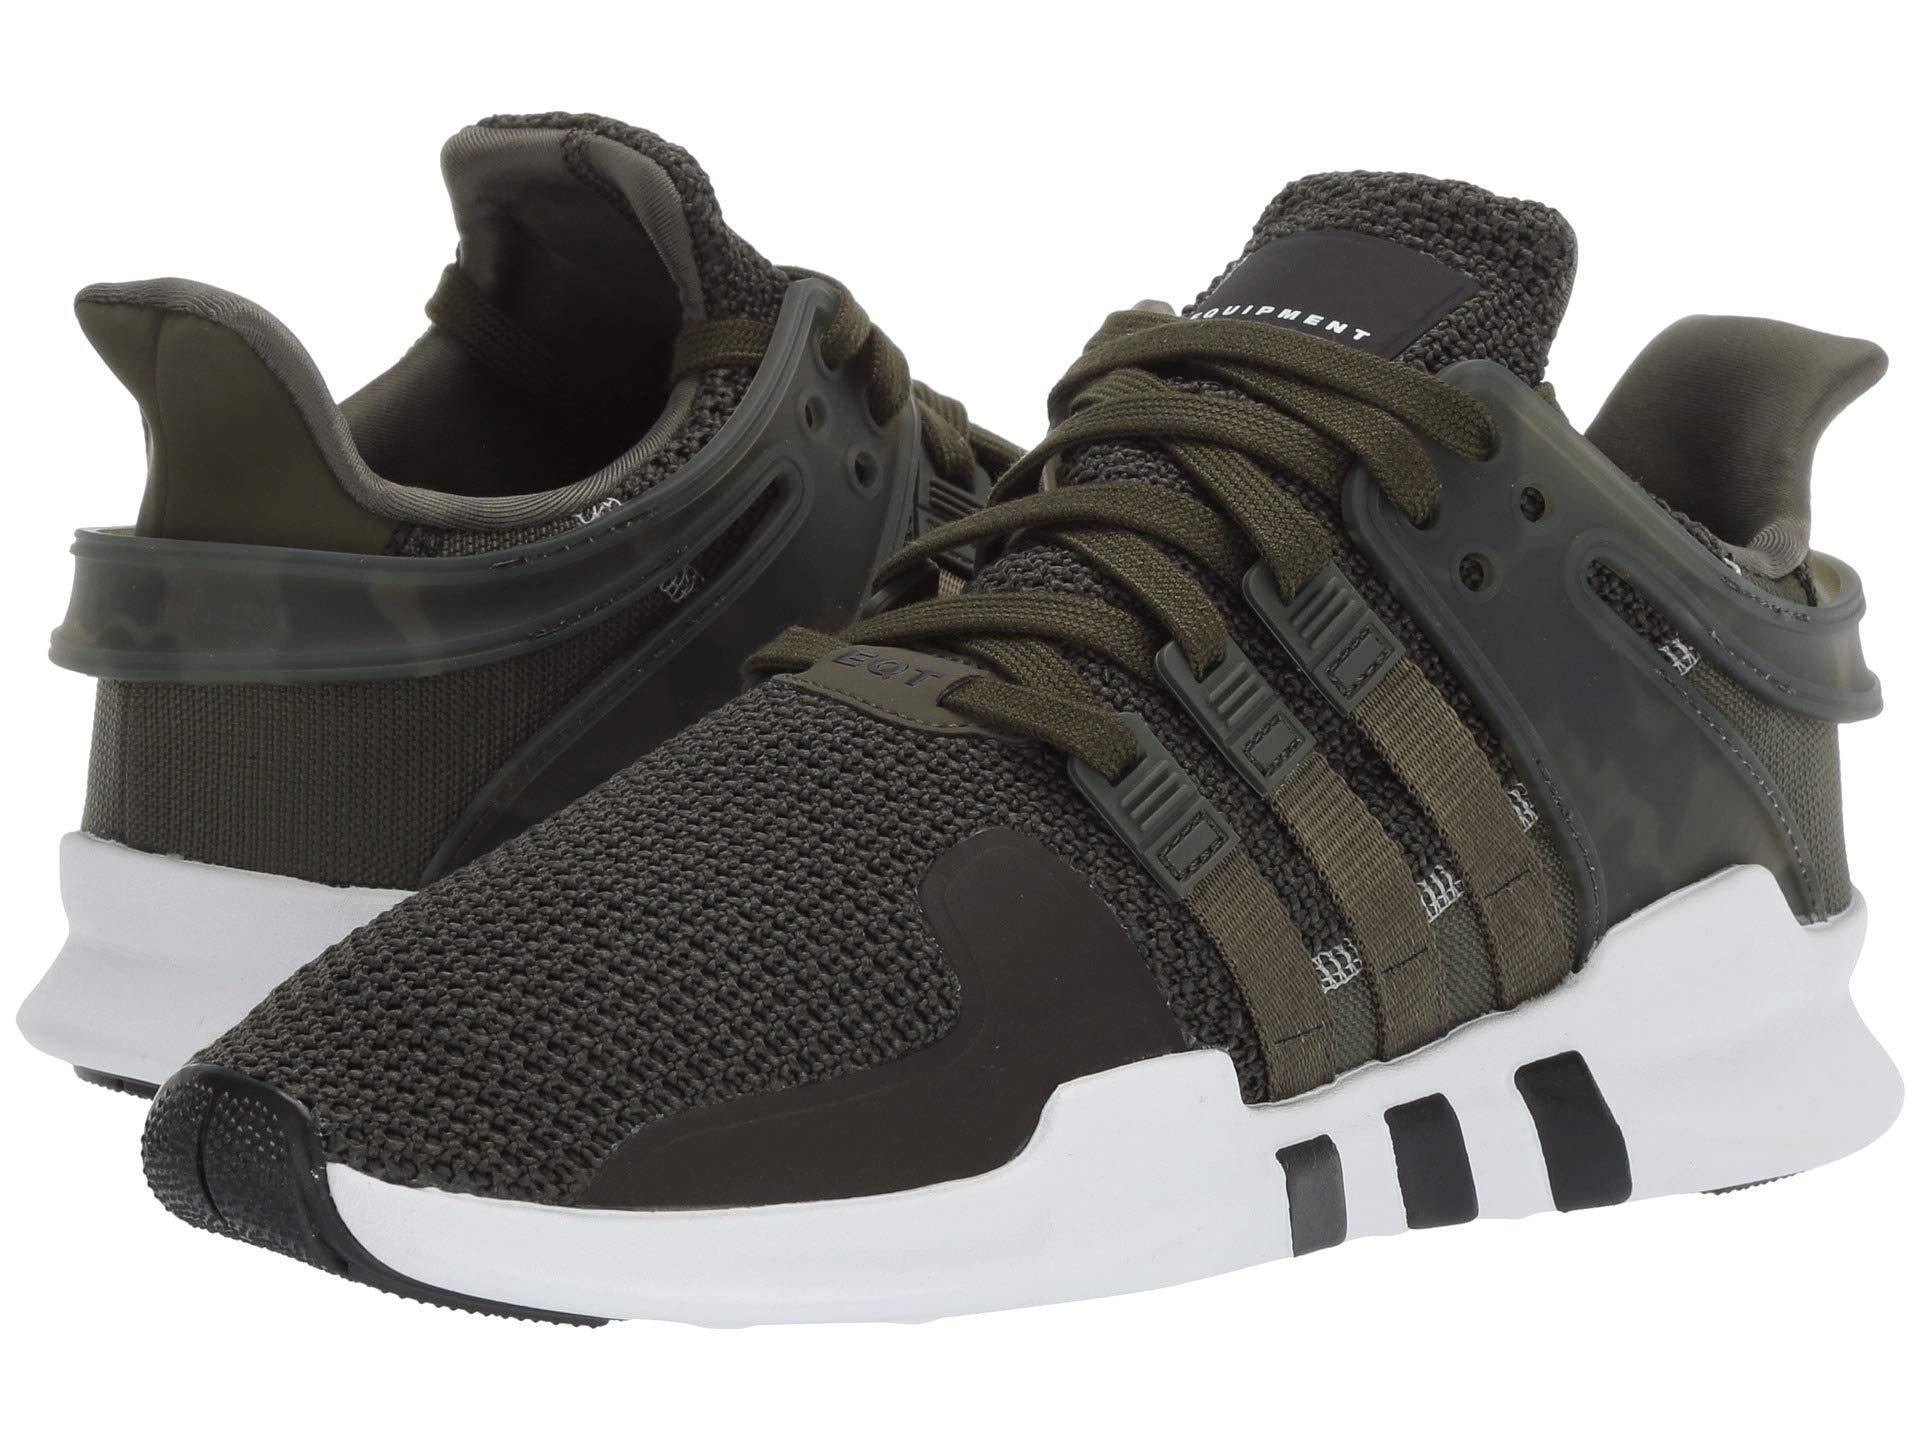 4cfb15177e84 adidas Originals. Eqt Support Adv (night Cargo white black) Men s Shoes